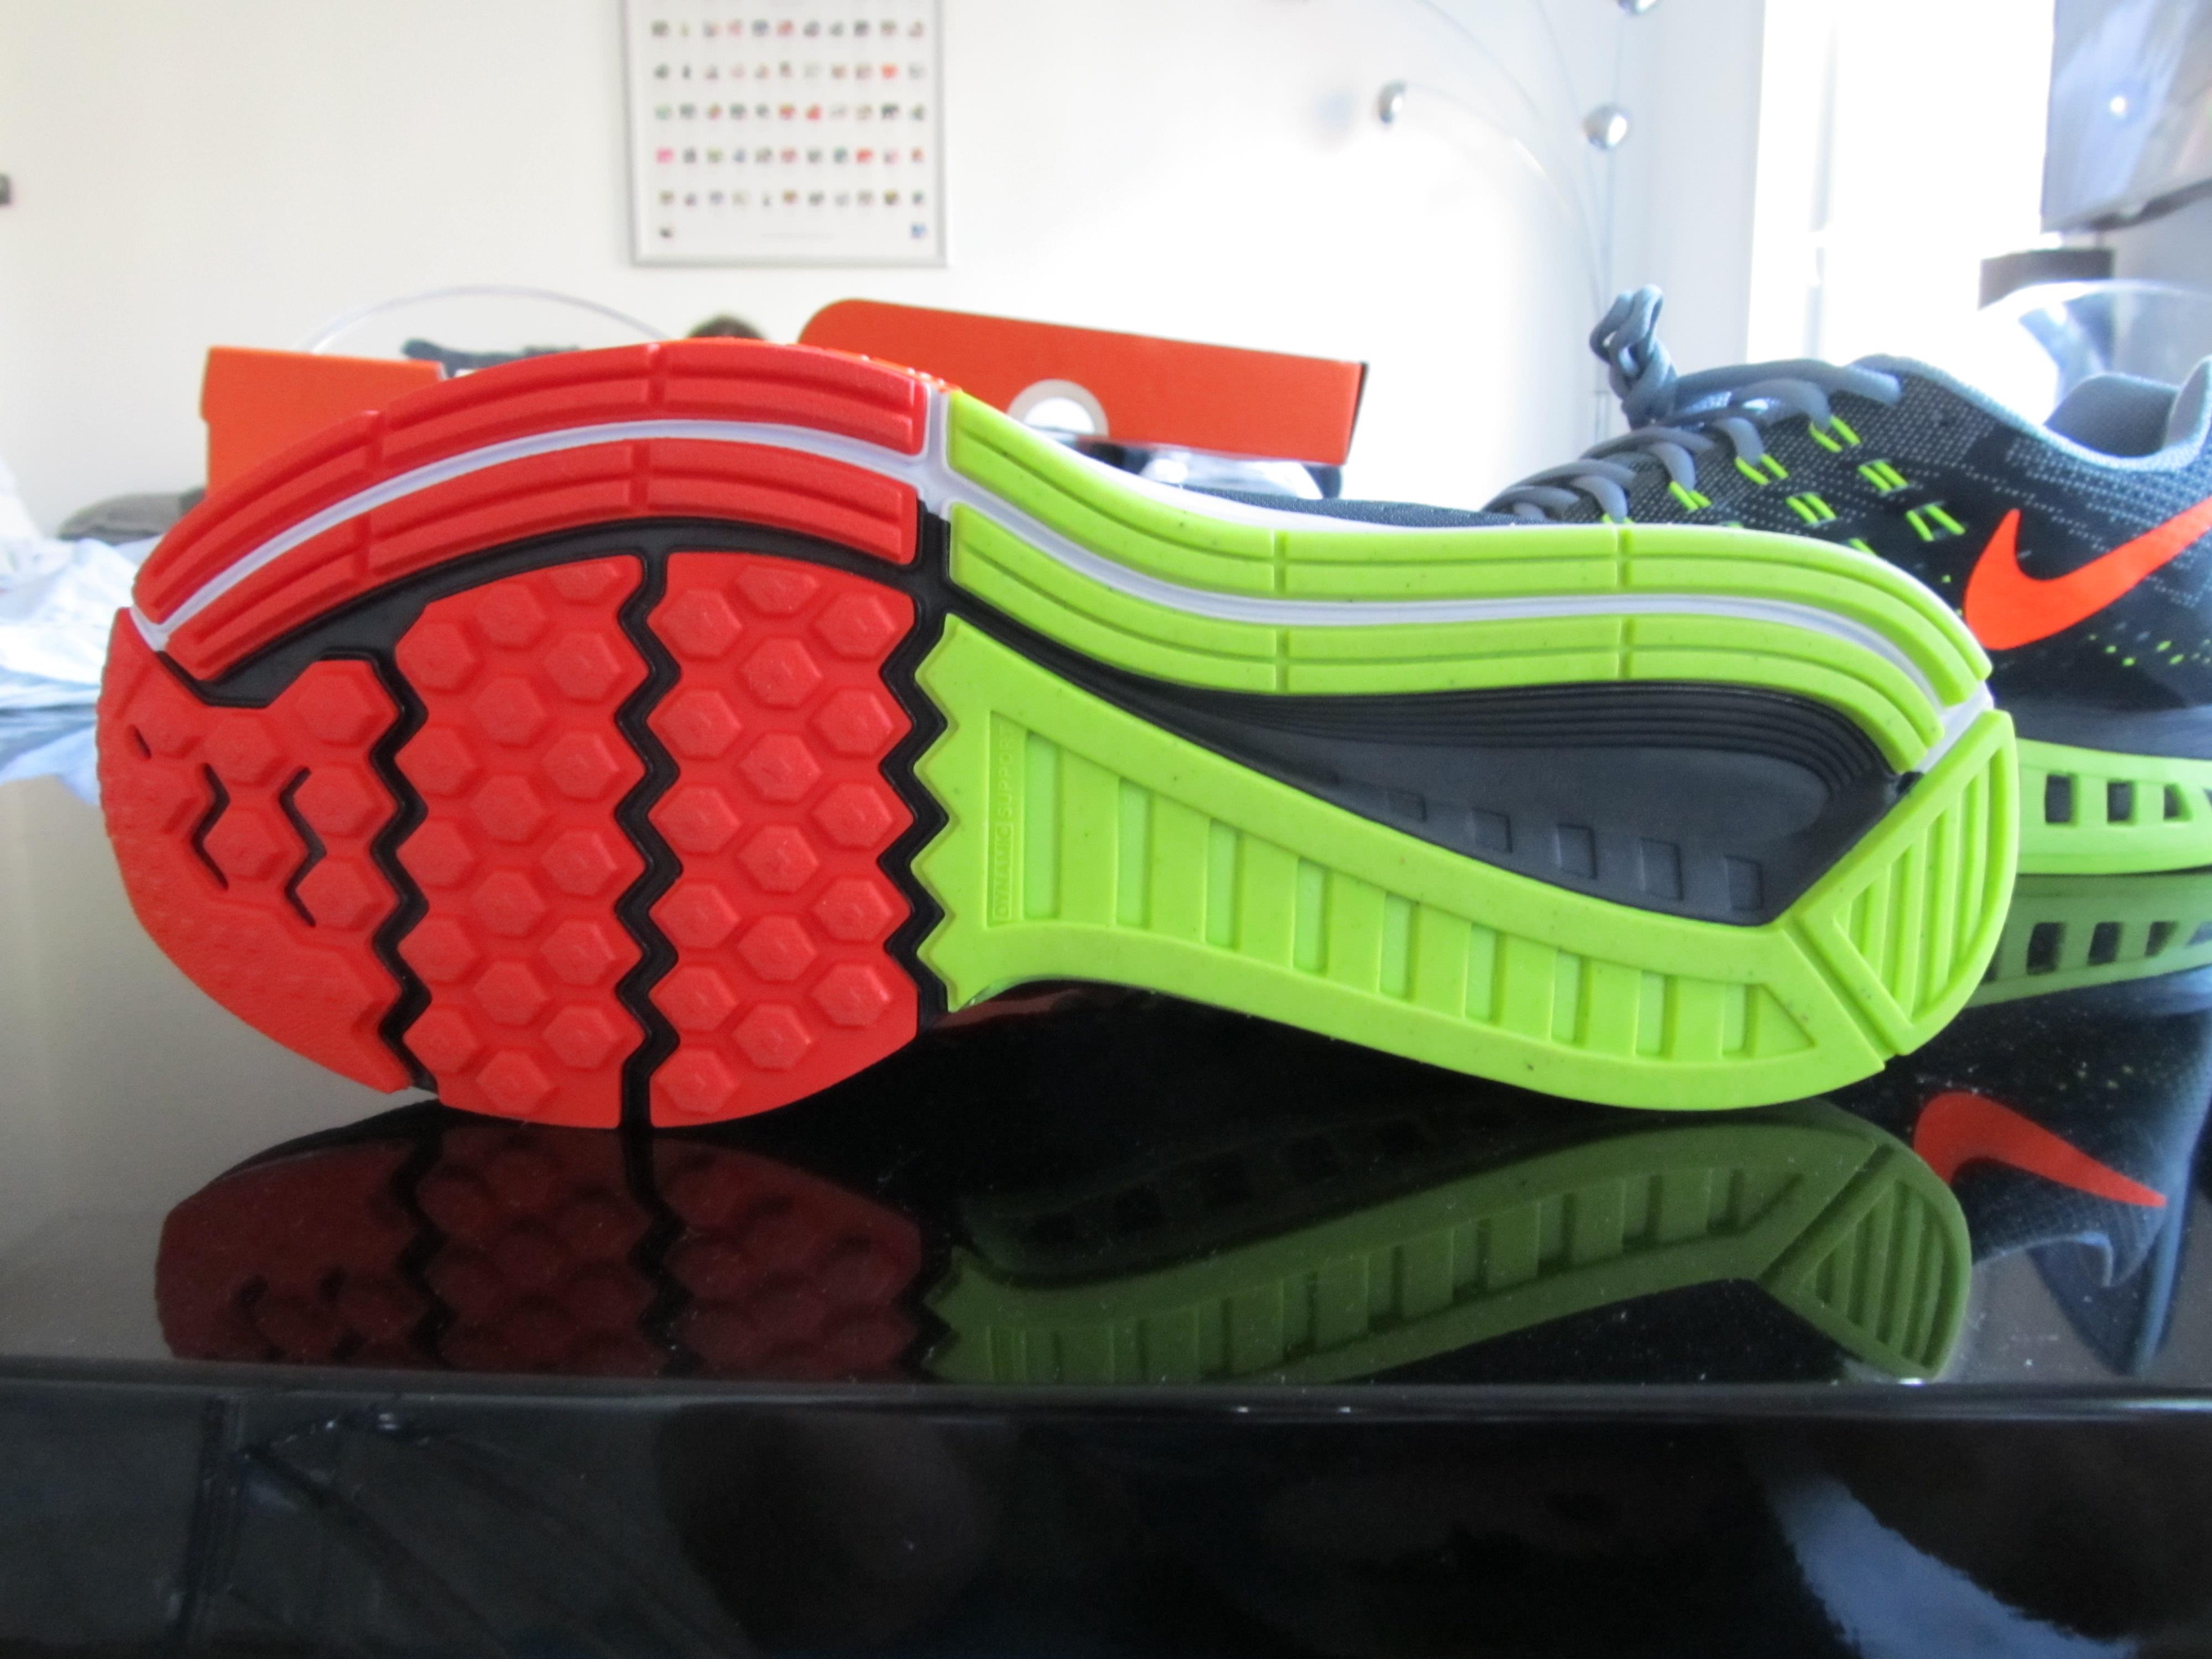 Nike Air Zoom Structure 18 Menn Løpesko Blå / Orange Joe 66TUNO1